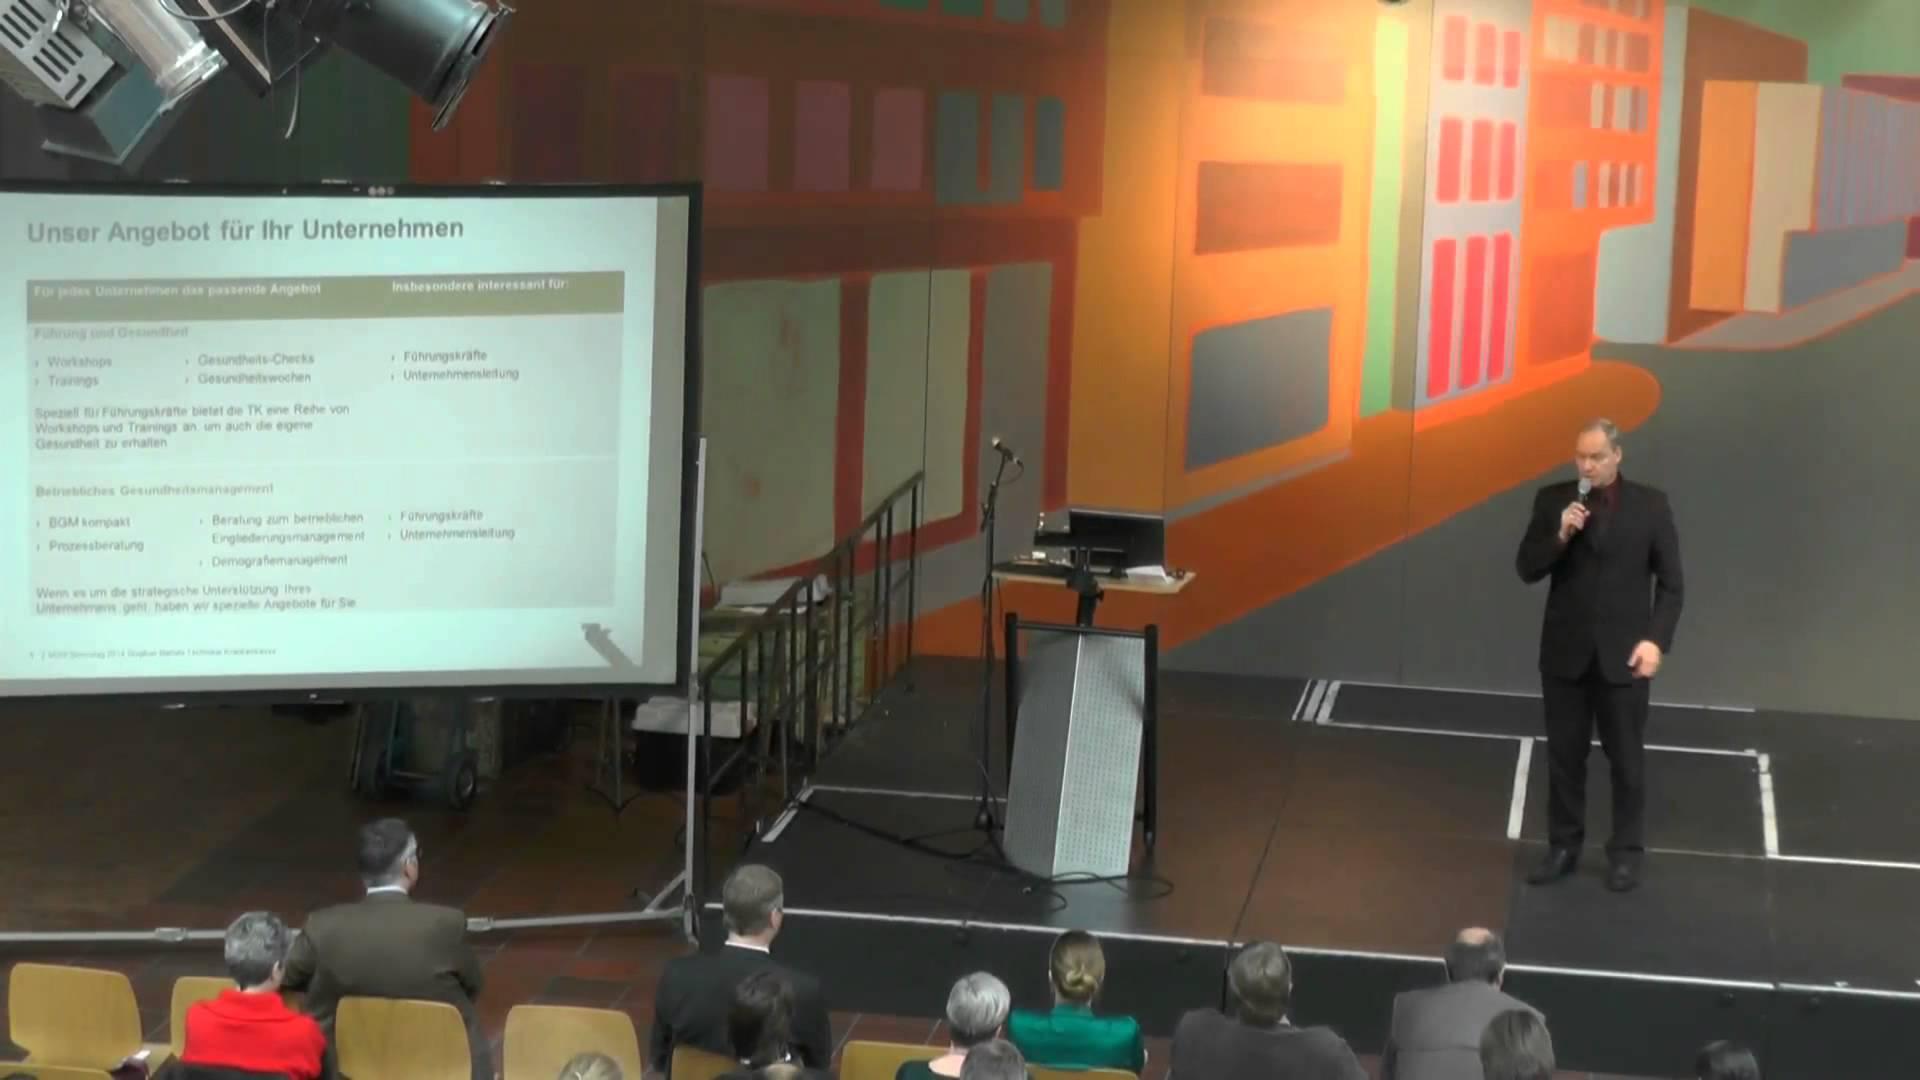 VDSI-Stresstag 2014 Vortrag von Herrn Stephan Bartels